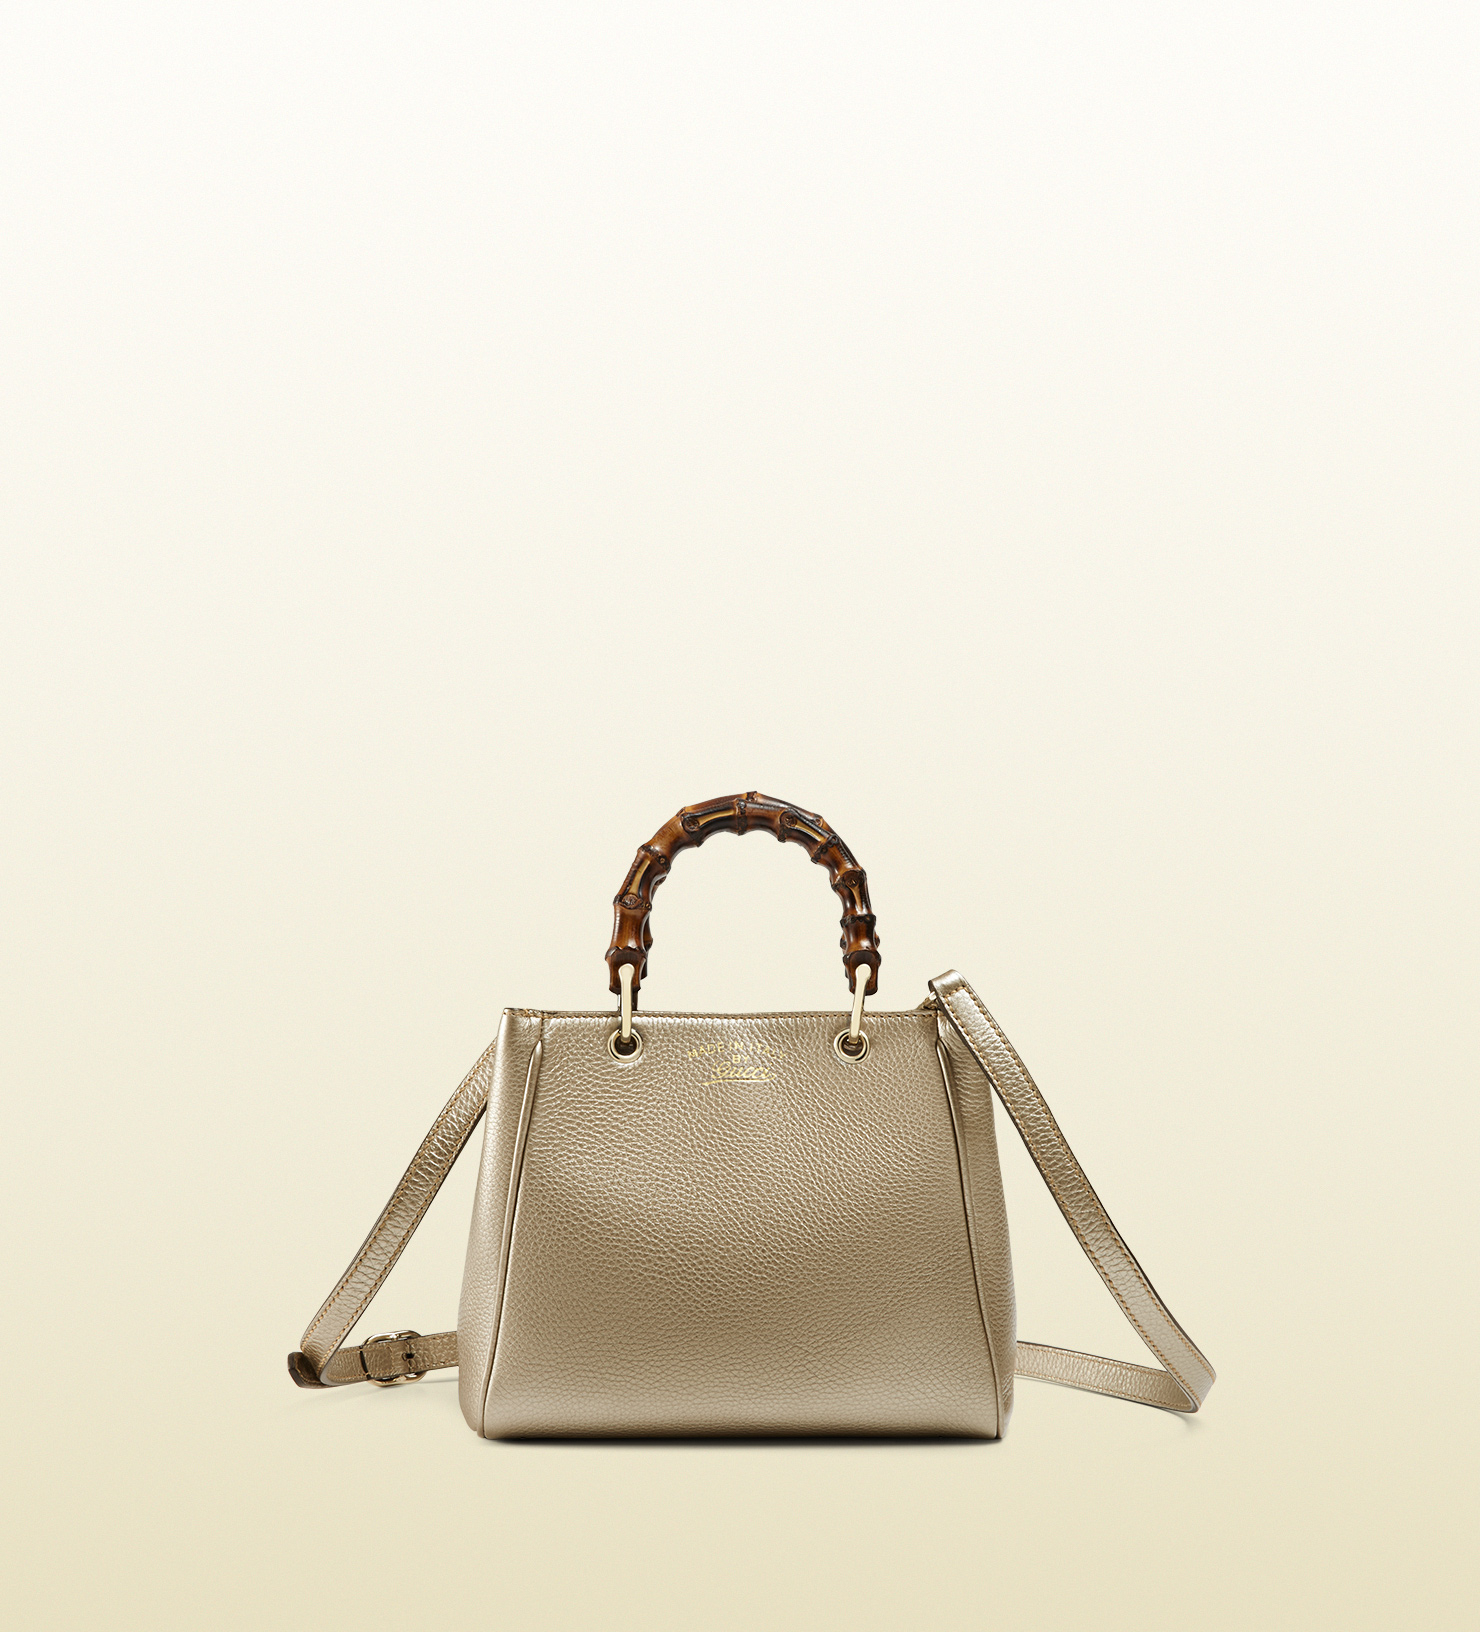 13973bedd35d Lyst - Gucci Bamboo Shopper Mini Metallic Leather Top Handle Bag in ...